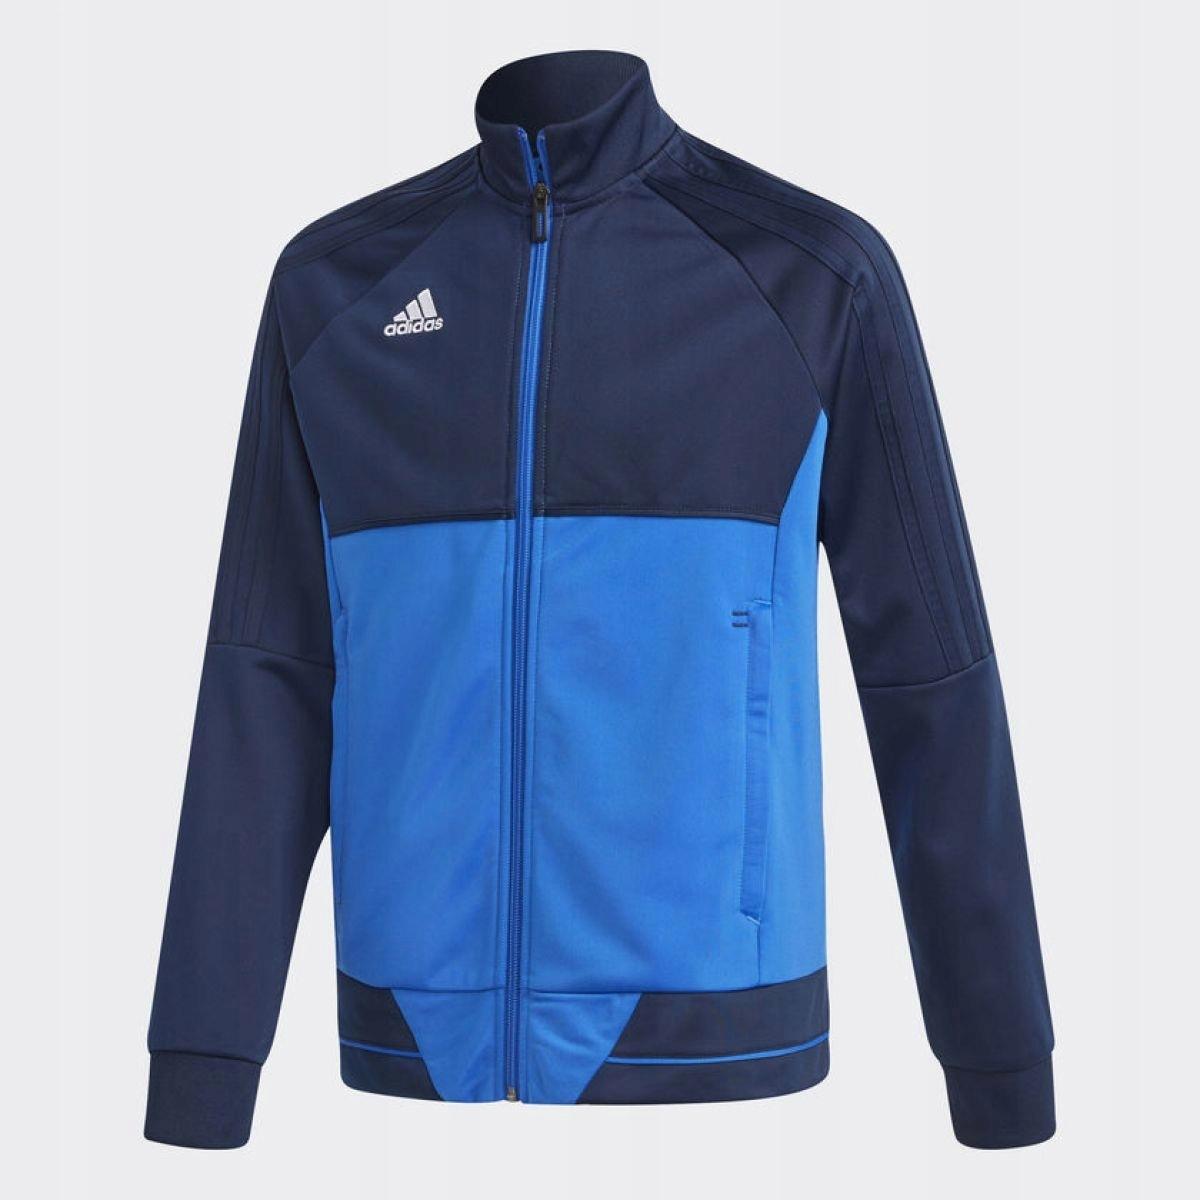 197b54c3a Bluza piłkarska adidas Tiro 17 Jr BQ2610 164 cm - 7535680086 ...